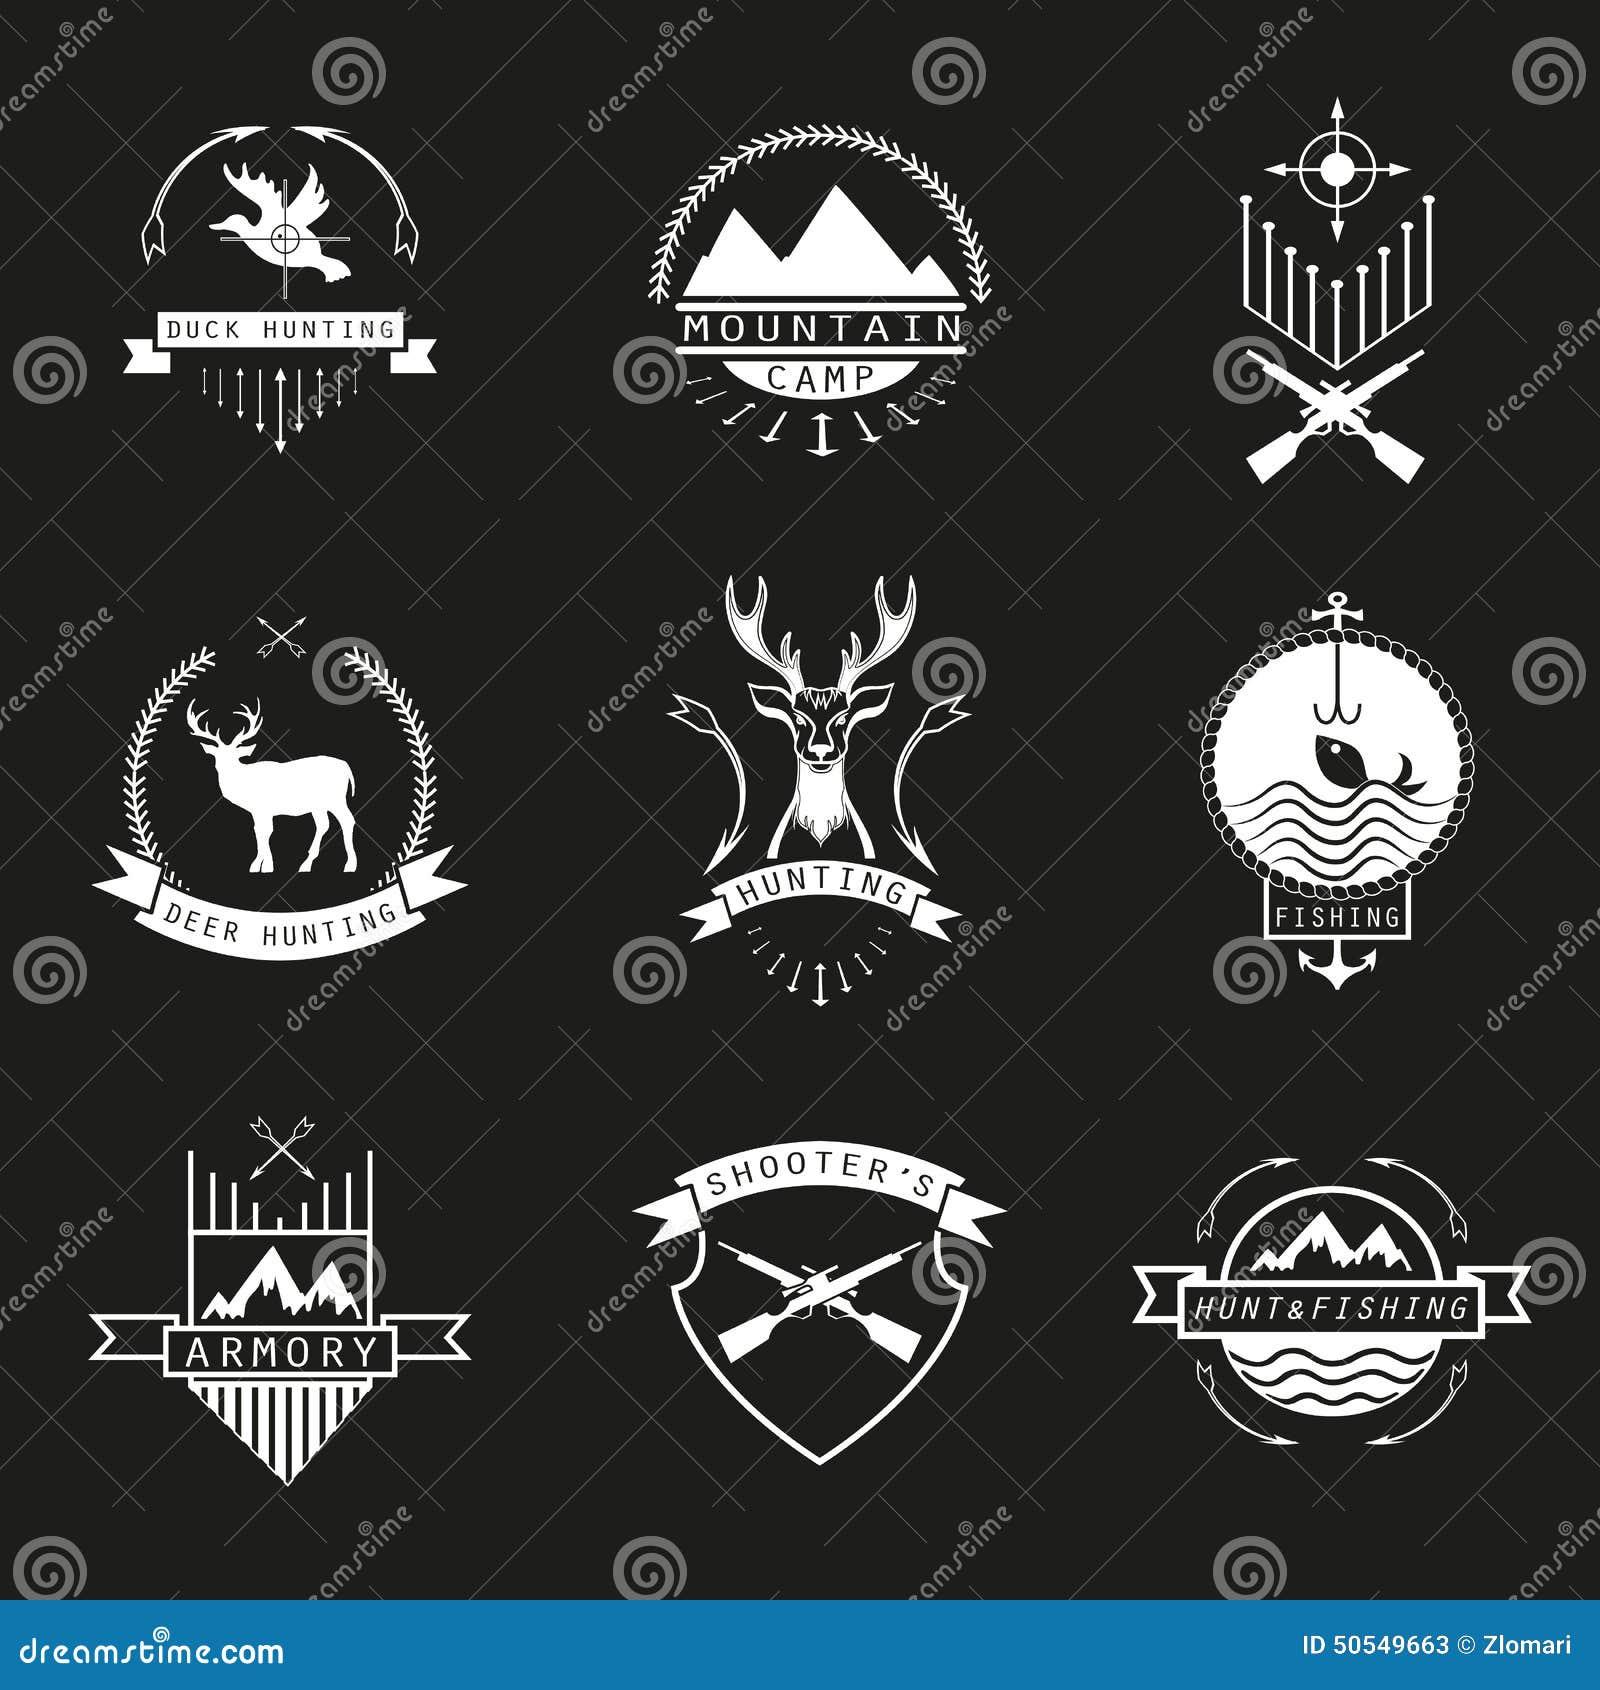 springfield armory logo wallpaper